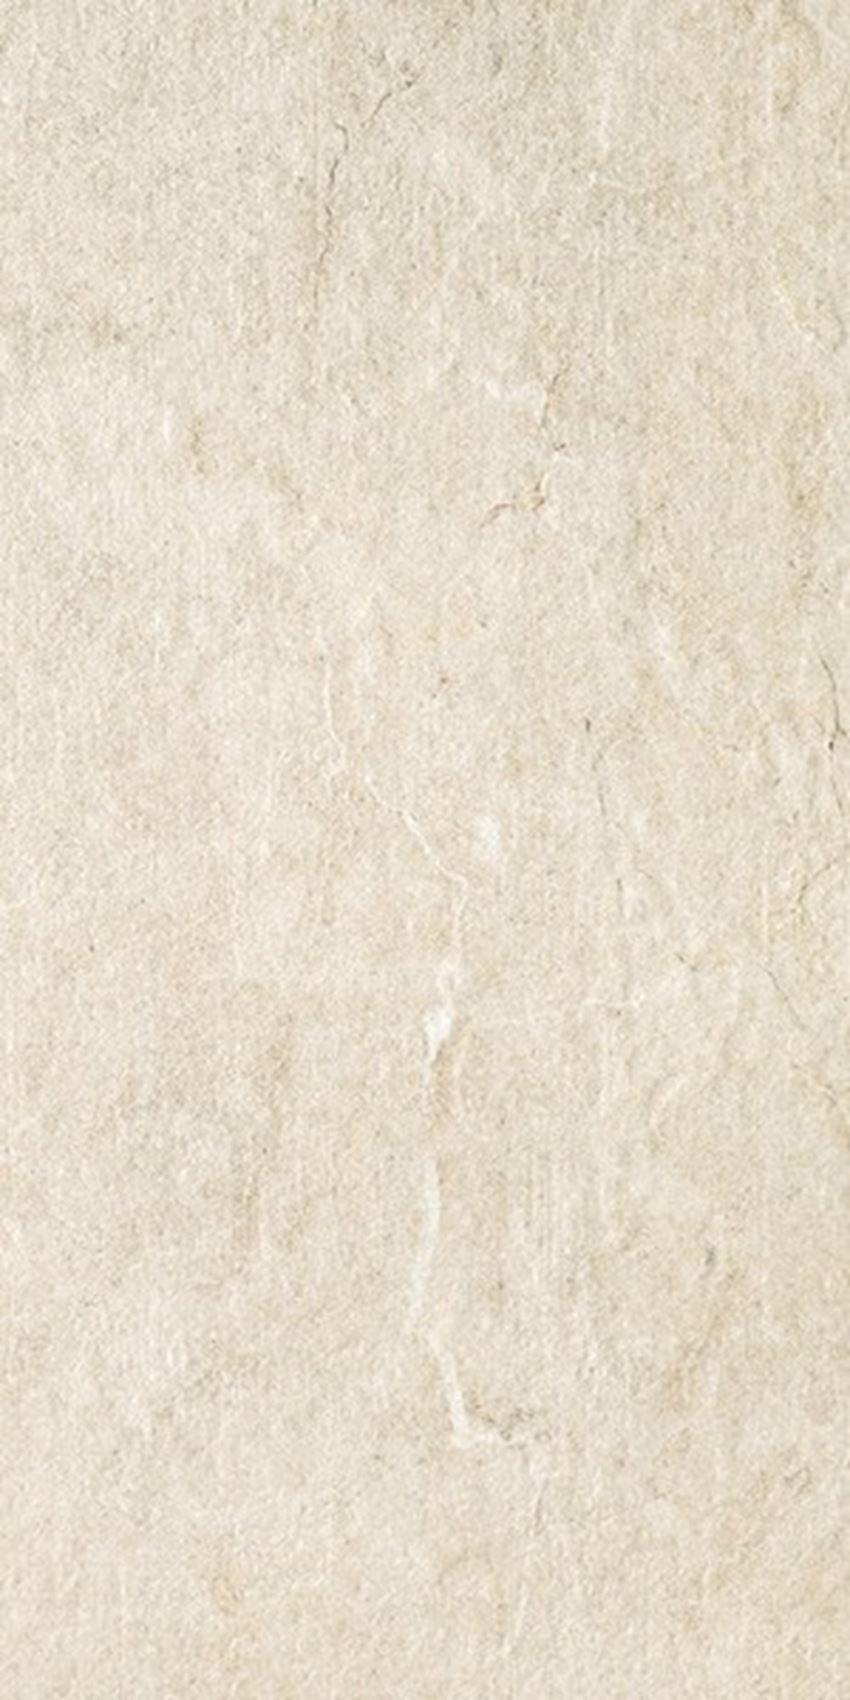 Płytka uniwersalna 29,7x59,7 cm  Ceramika Gres Estile ETL 02